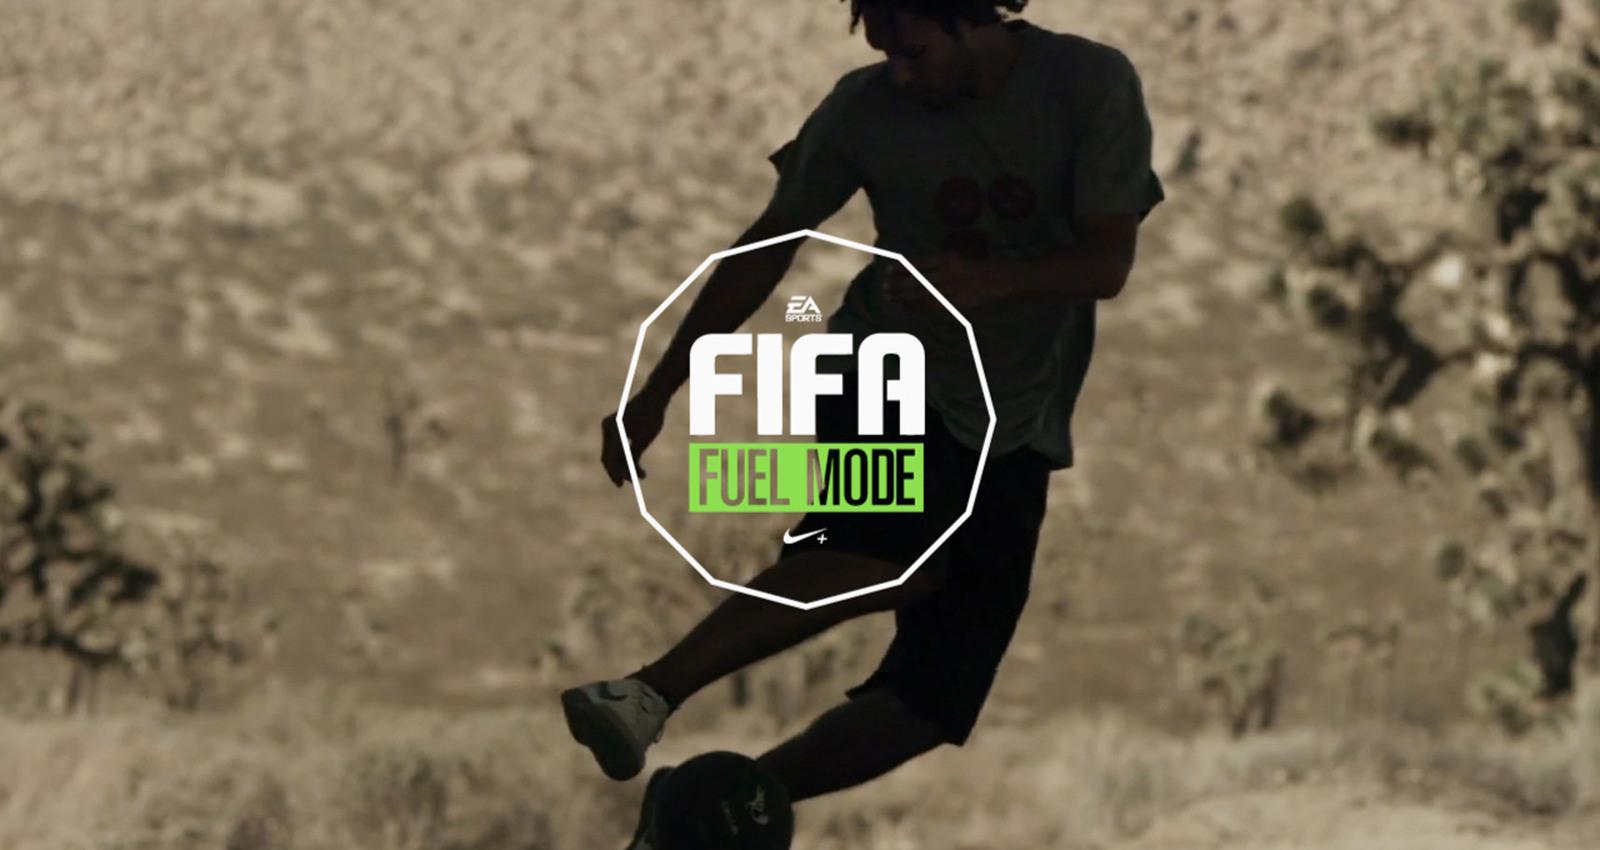 FIFA Fuel Mode